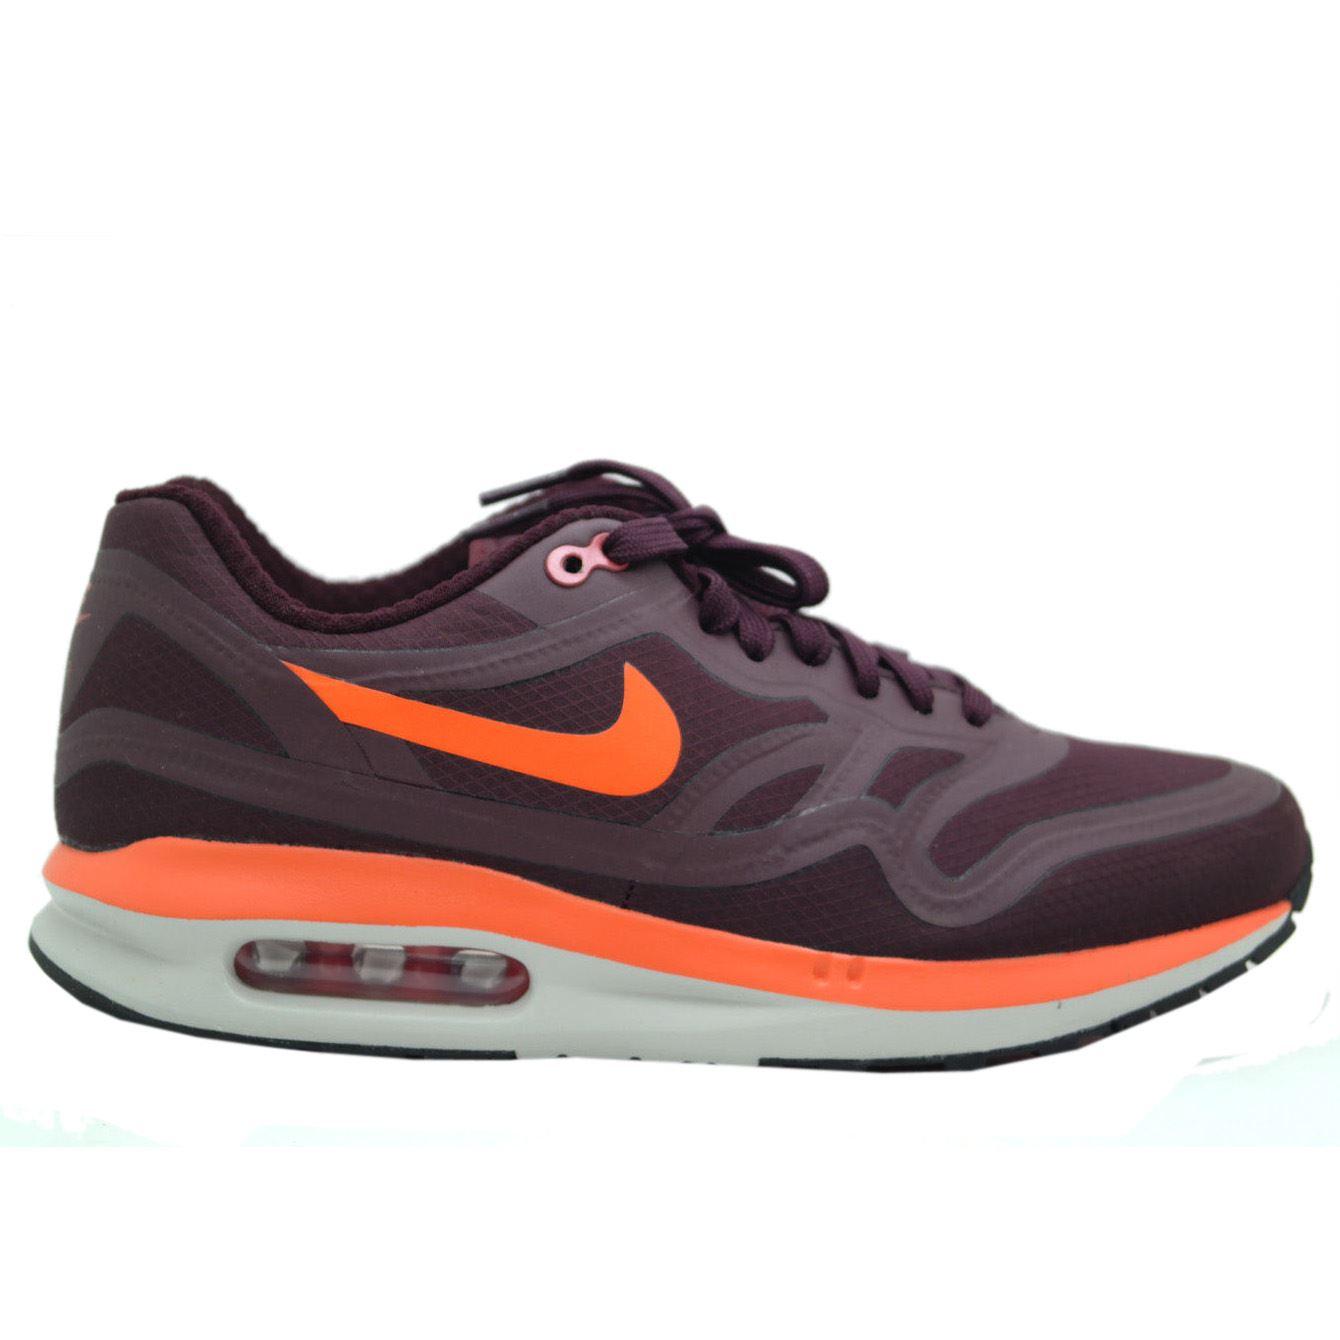 8898a4fb00f Jordan Retro 4 Buy Now Uk